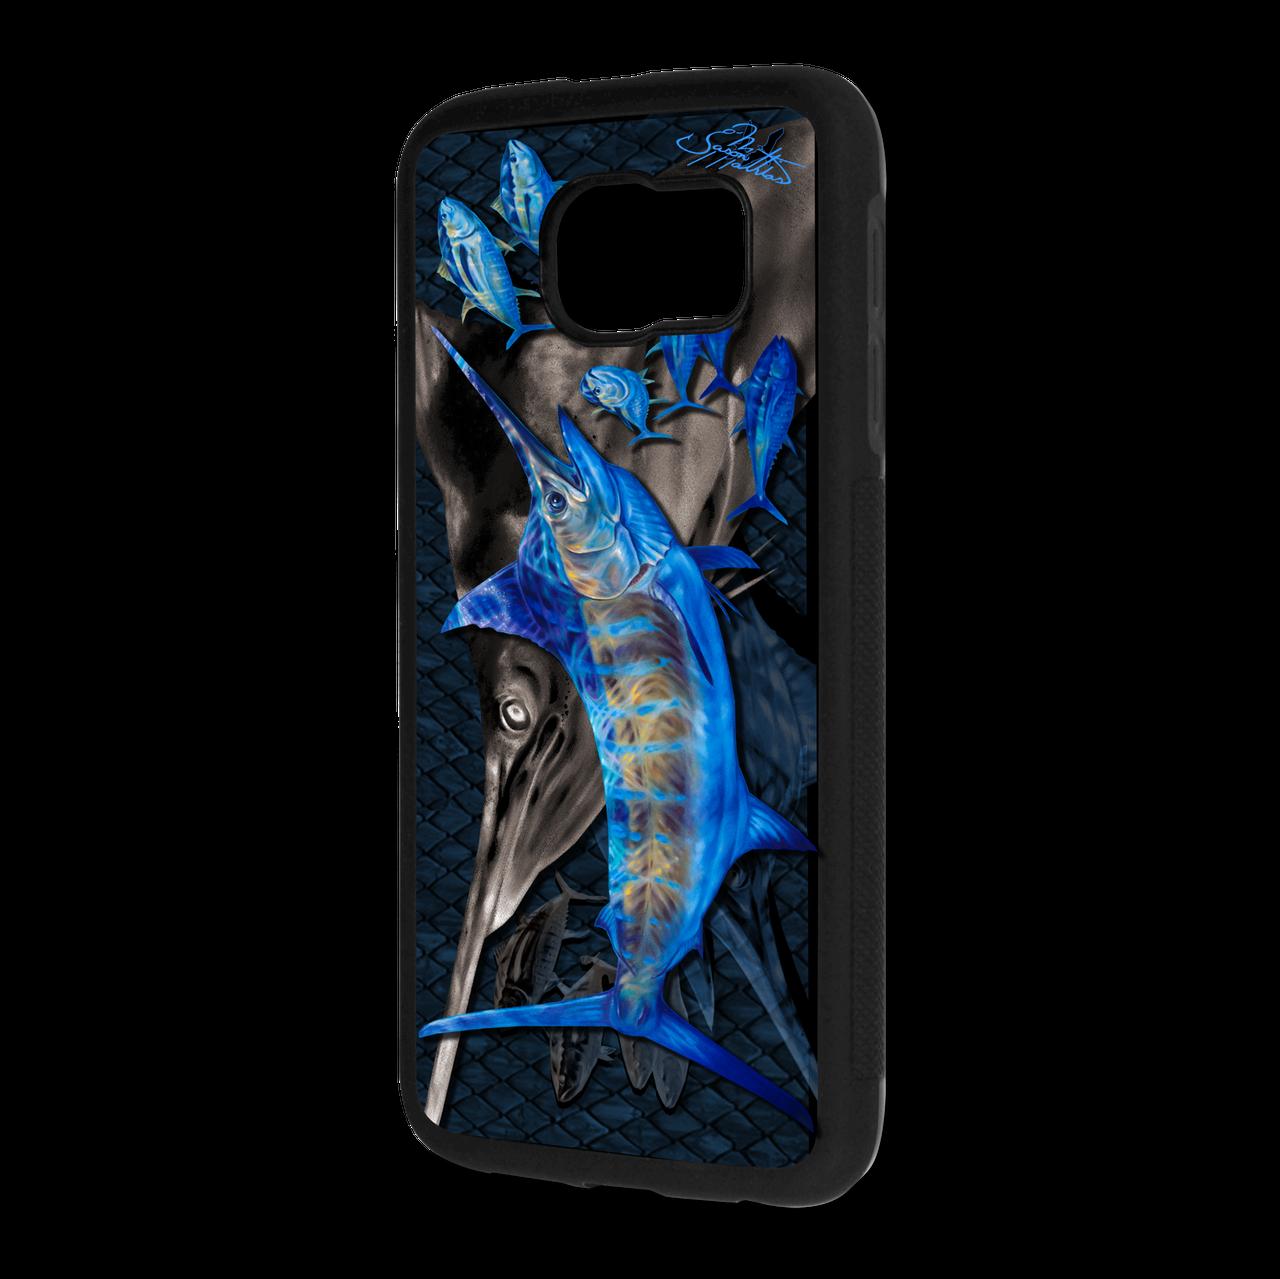 samsung-galaxy-case-cover-blue-marlin-jason-mathias-art-.png